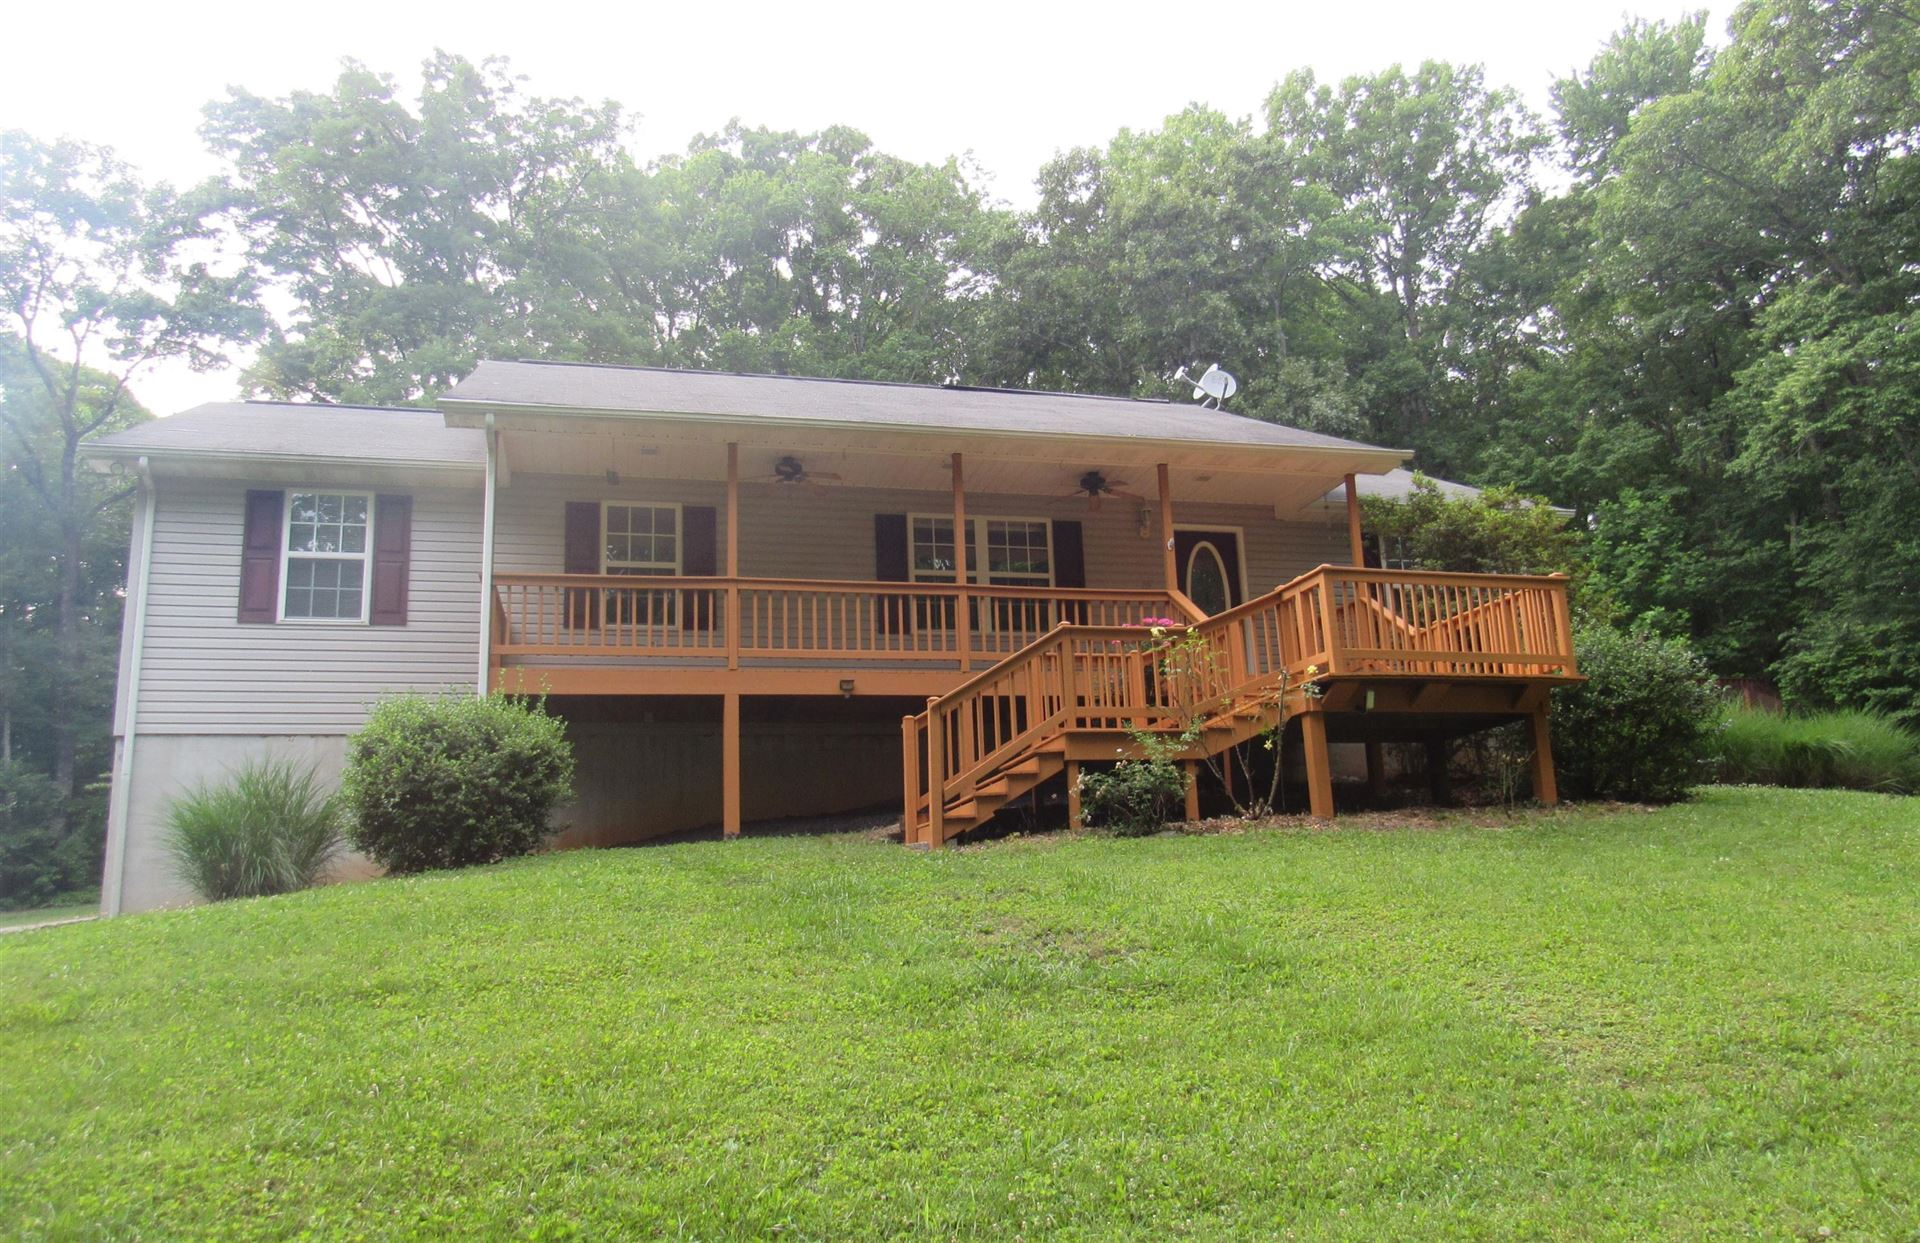 Photo of 180 Shelton Lane, Clinton, TN 37716 (MLS # 1119564)